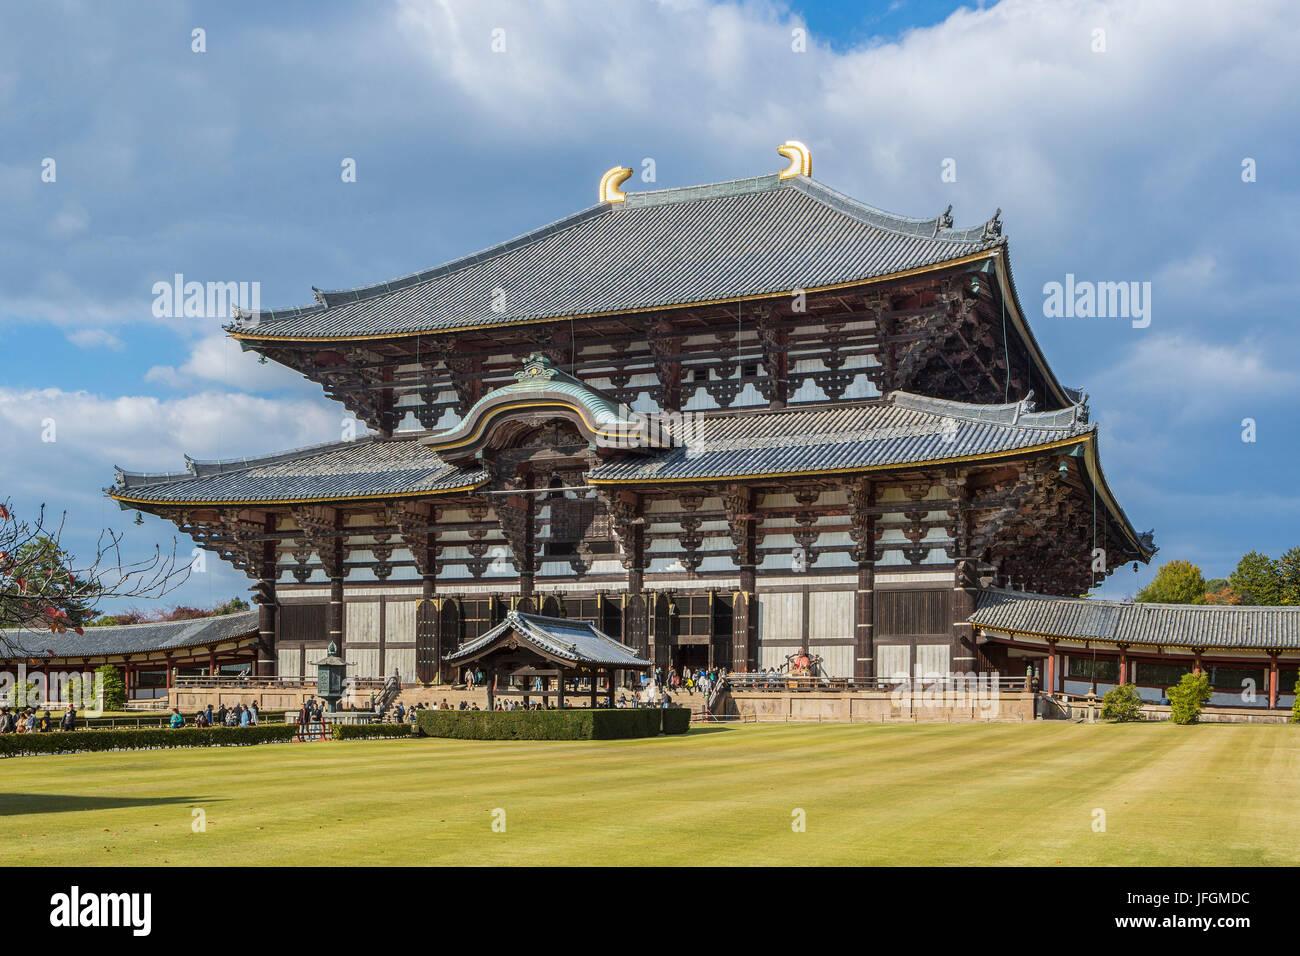 Japan, Kansai, Nara City, Todai-ji Temple, UNESCO World Heritage, Stock Photo